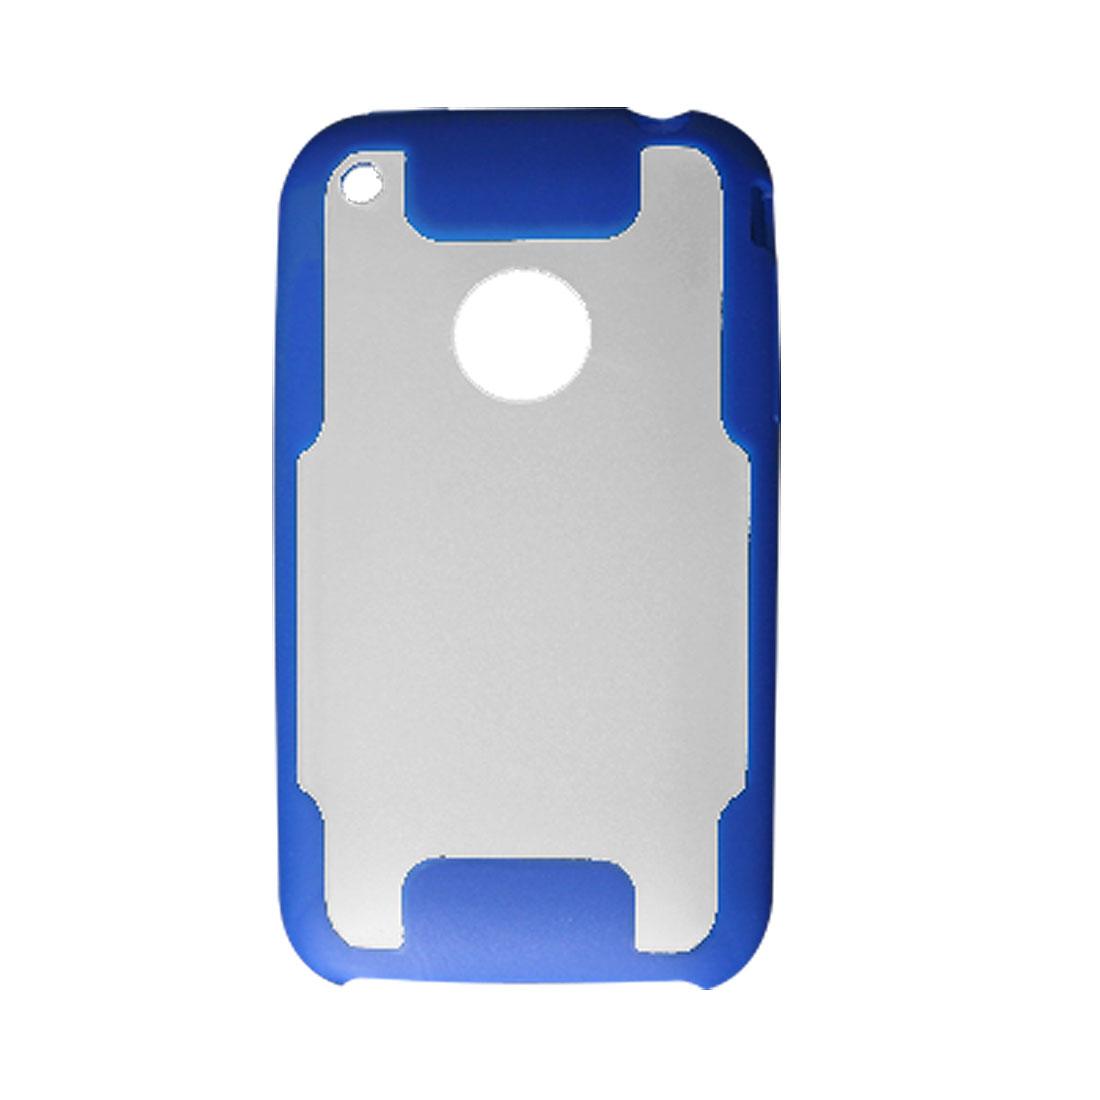 Blue Frame Hard Plastic Back Case Cover for iPhone 3G